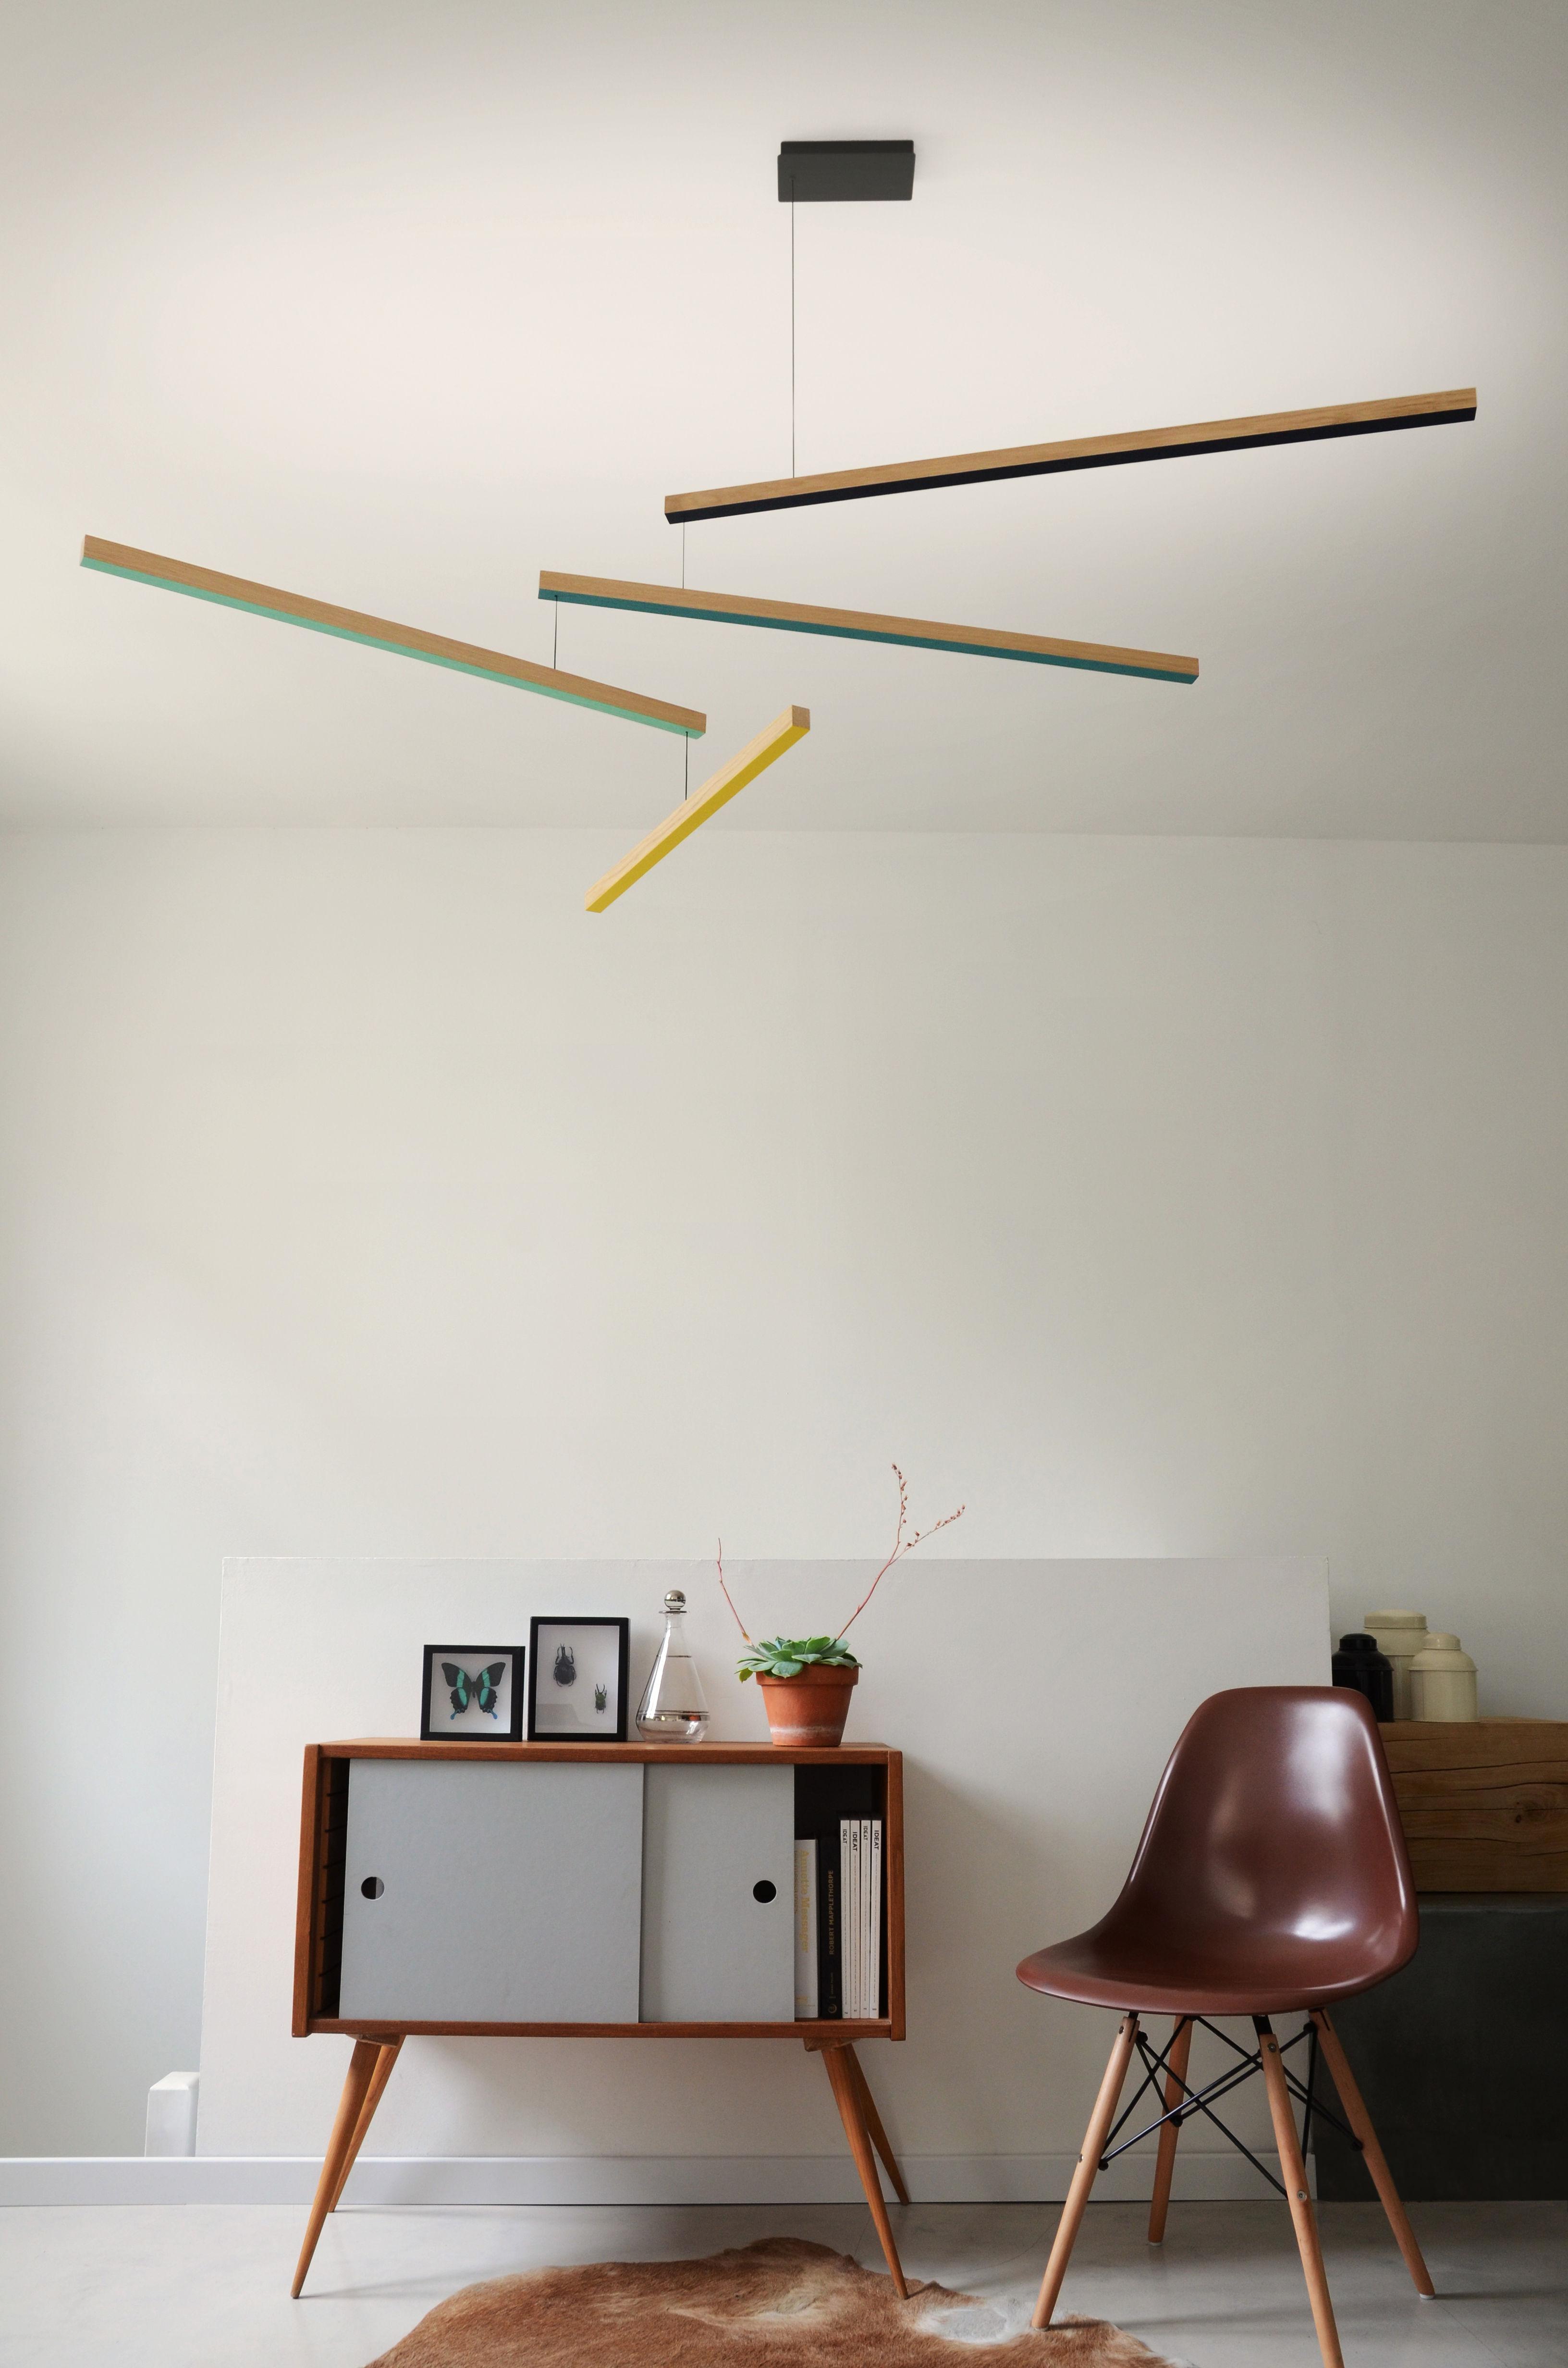 suspension tasso th led ch ne l 155 cm jaune vert turquoise marine bois presse citron. Black Bedroom Furniture Sets. Home Design Ideas